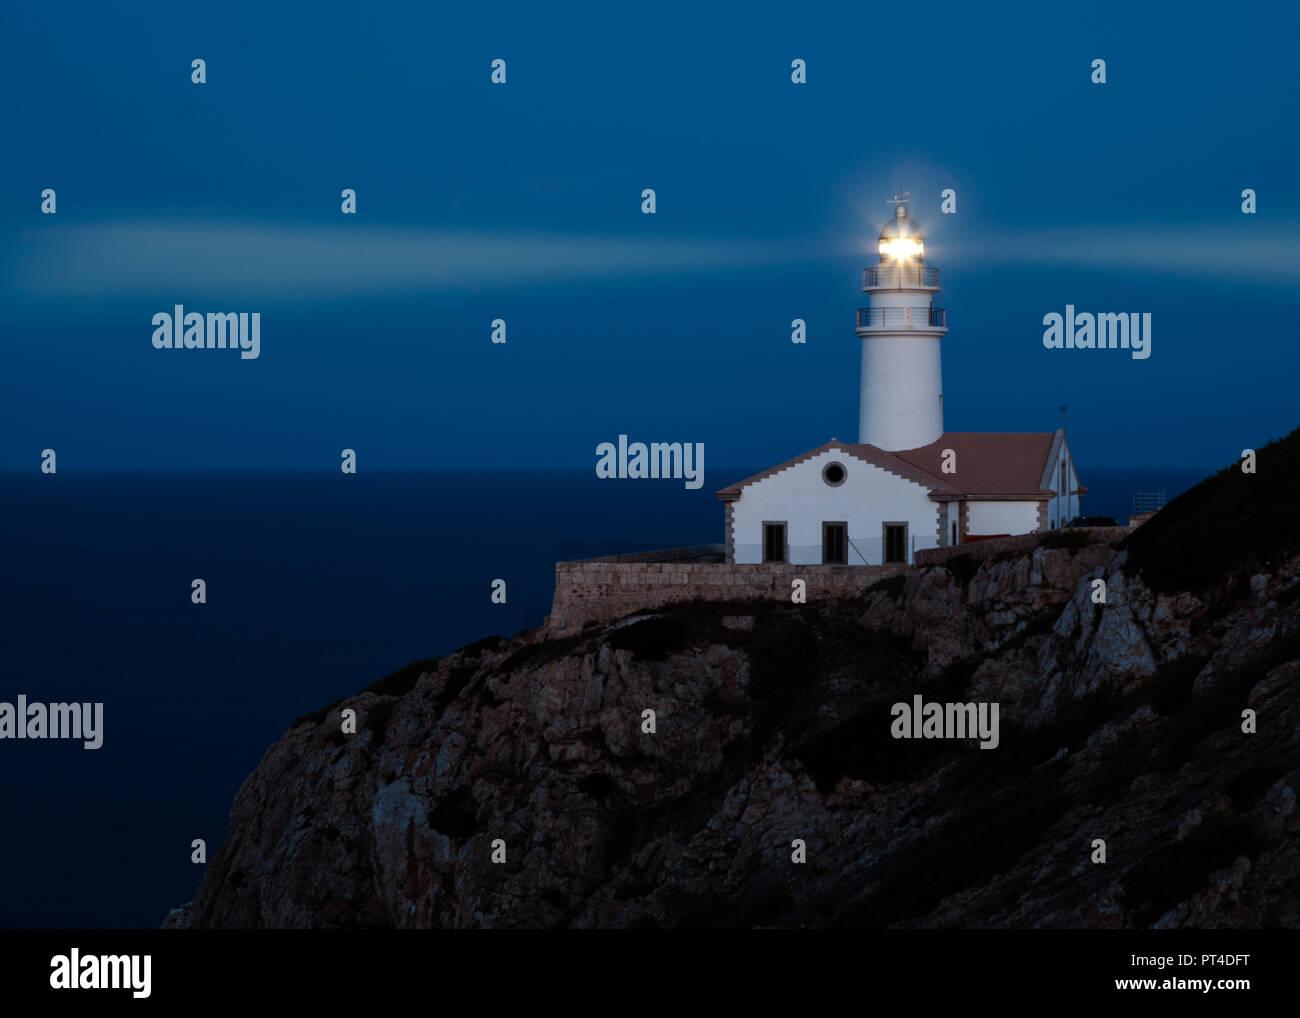 Leuchtturm von Capdepera, Cala Ratjada, Mallorca, Balearen, Spanien, Europa bei Nacht mit Leuchtstrahlen Stockbild